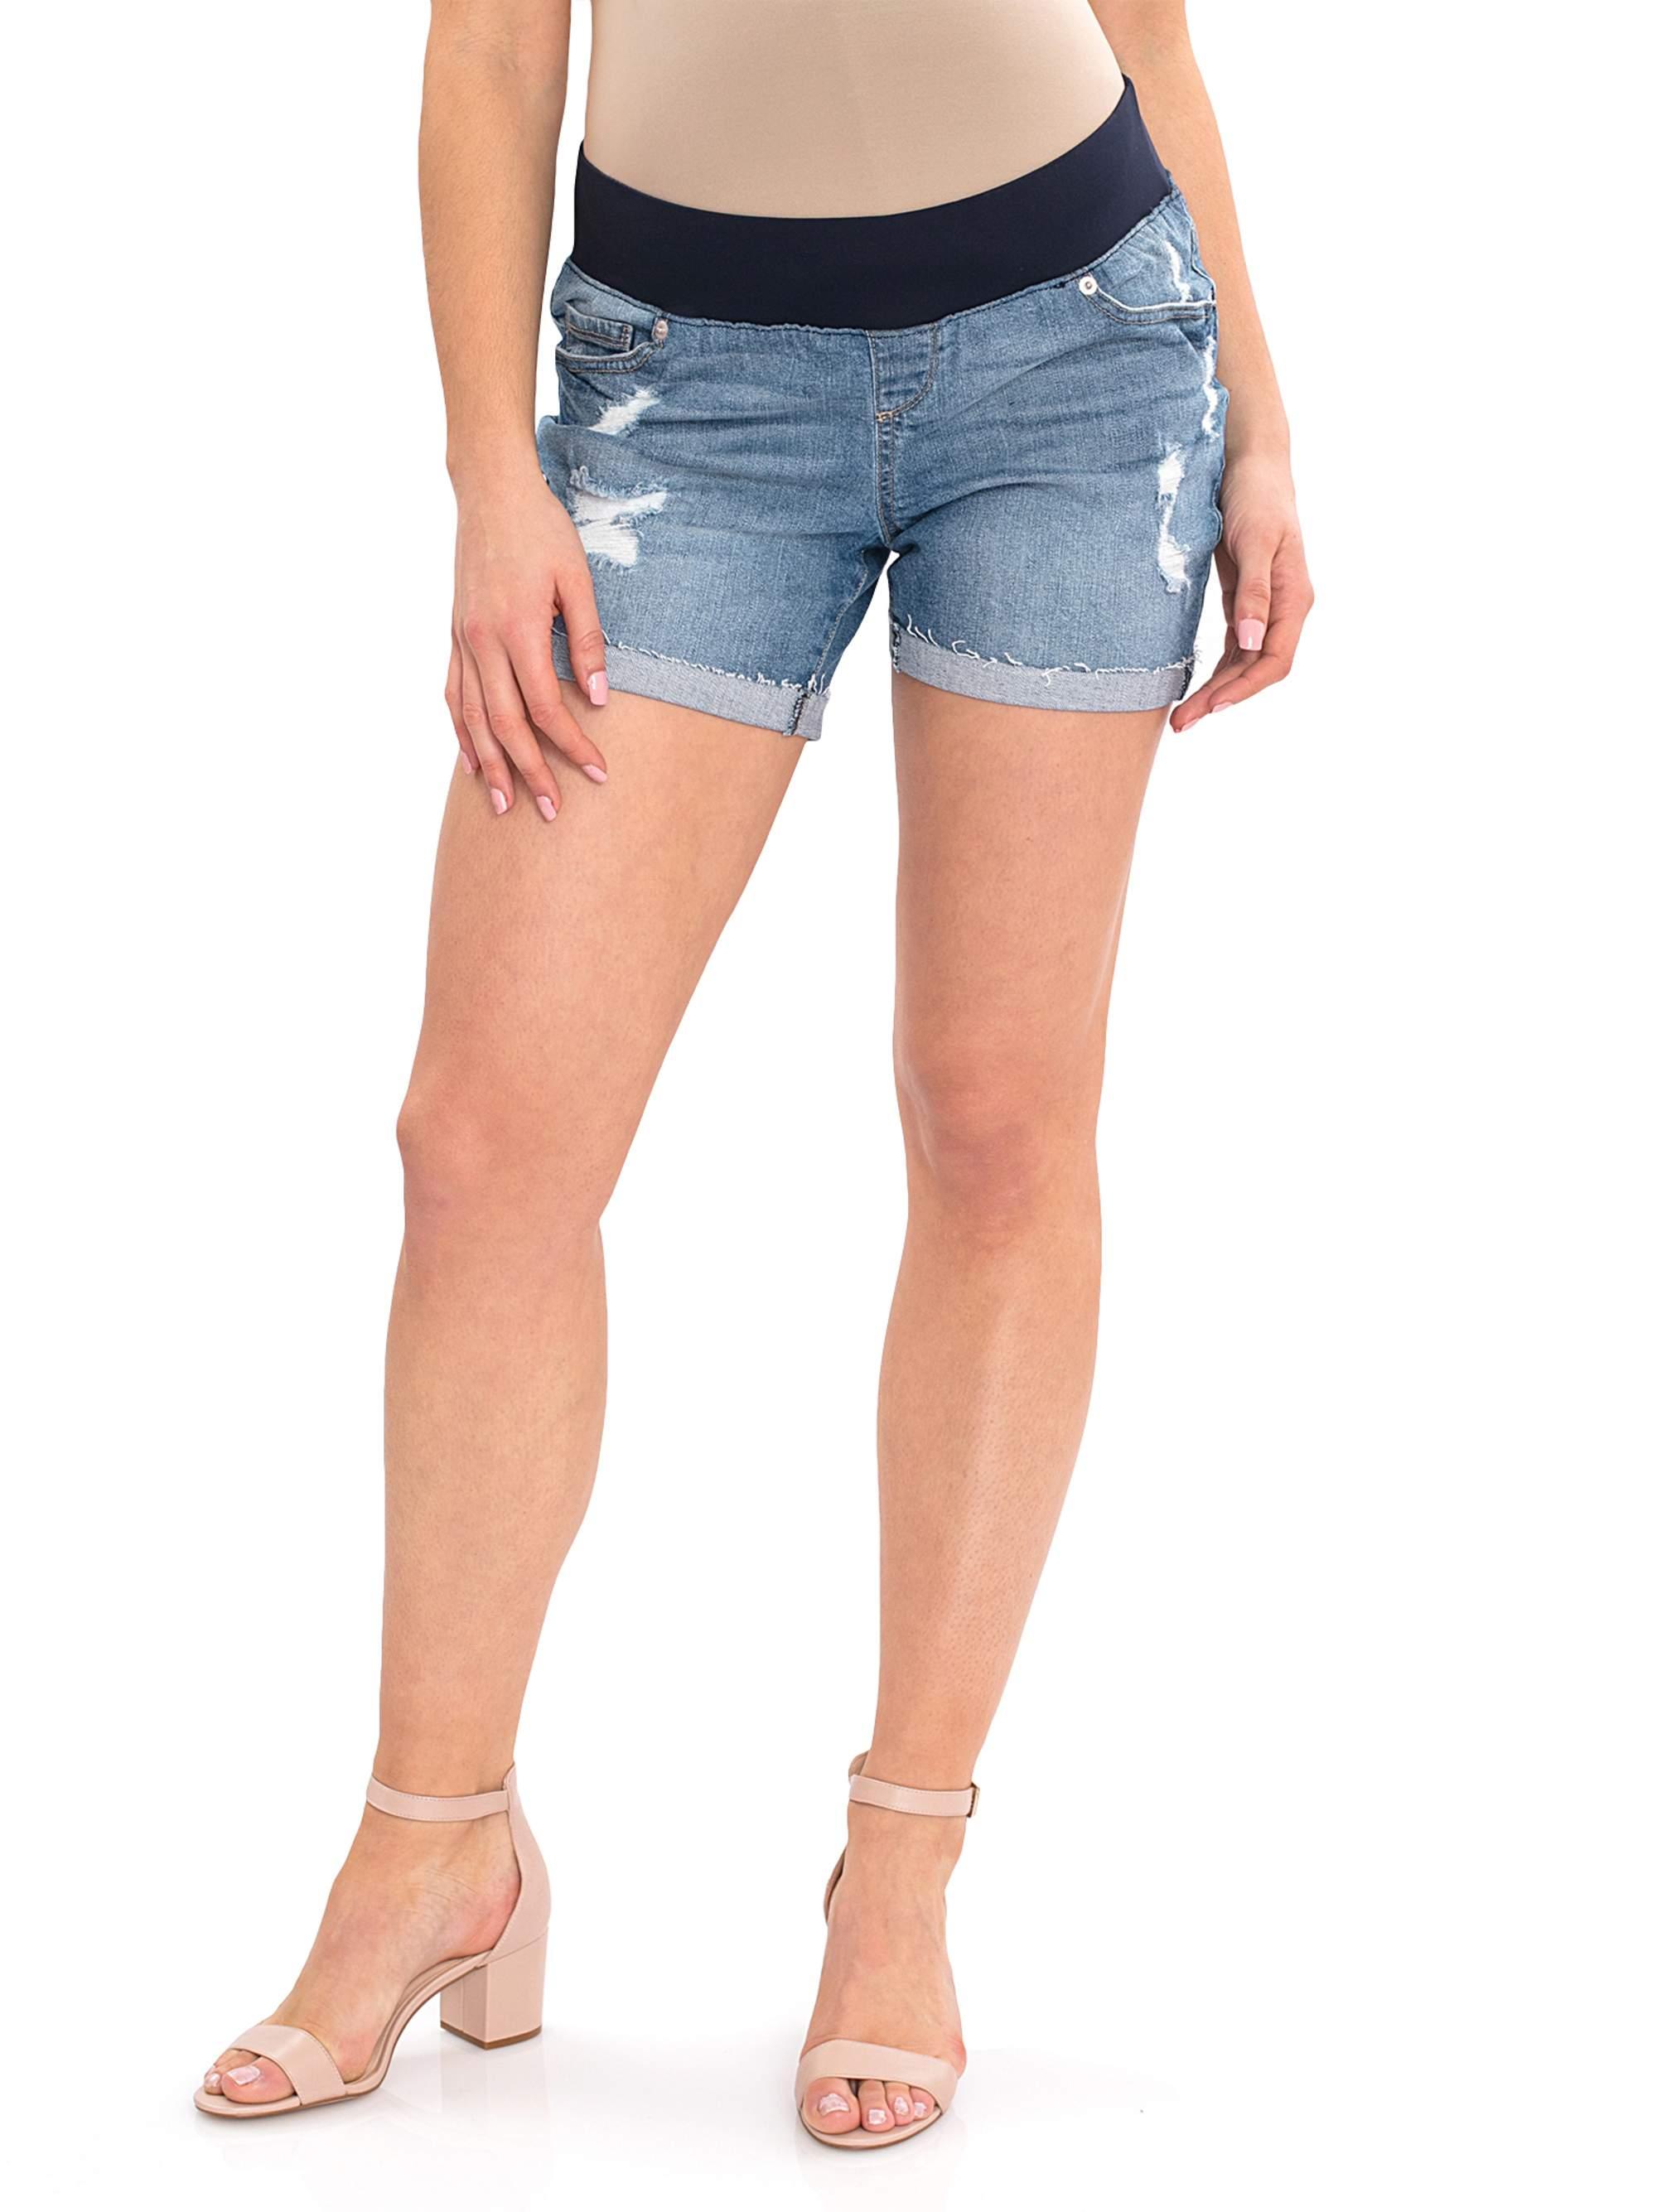 c6dd818a16fcf Great Expectations - Maternity Denim Shorts - Walmart.com